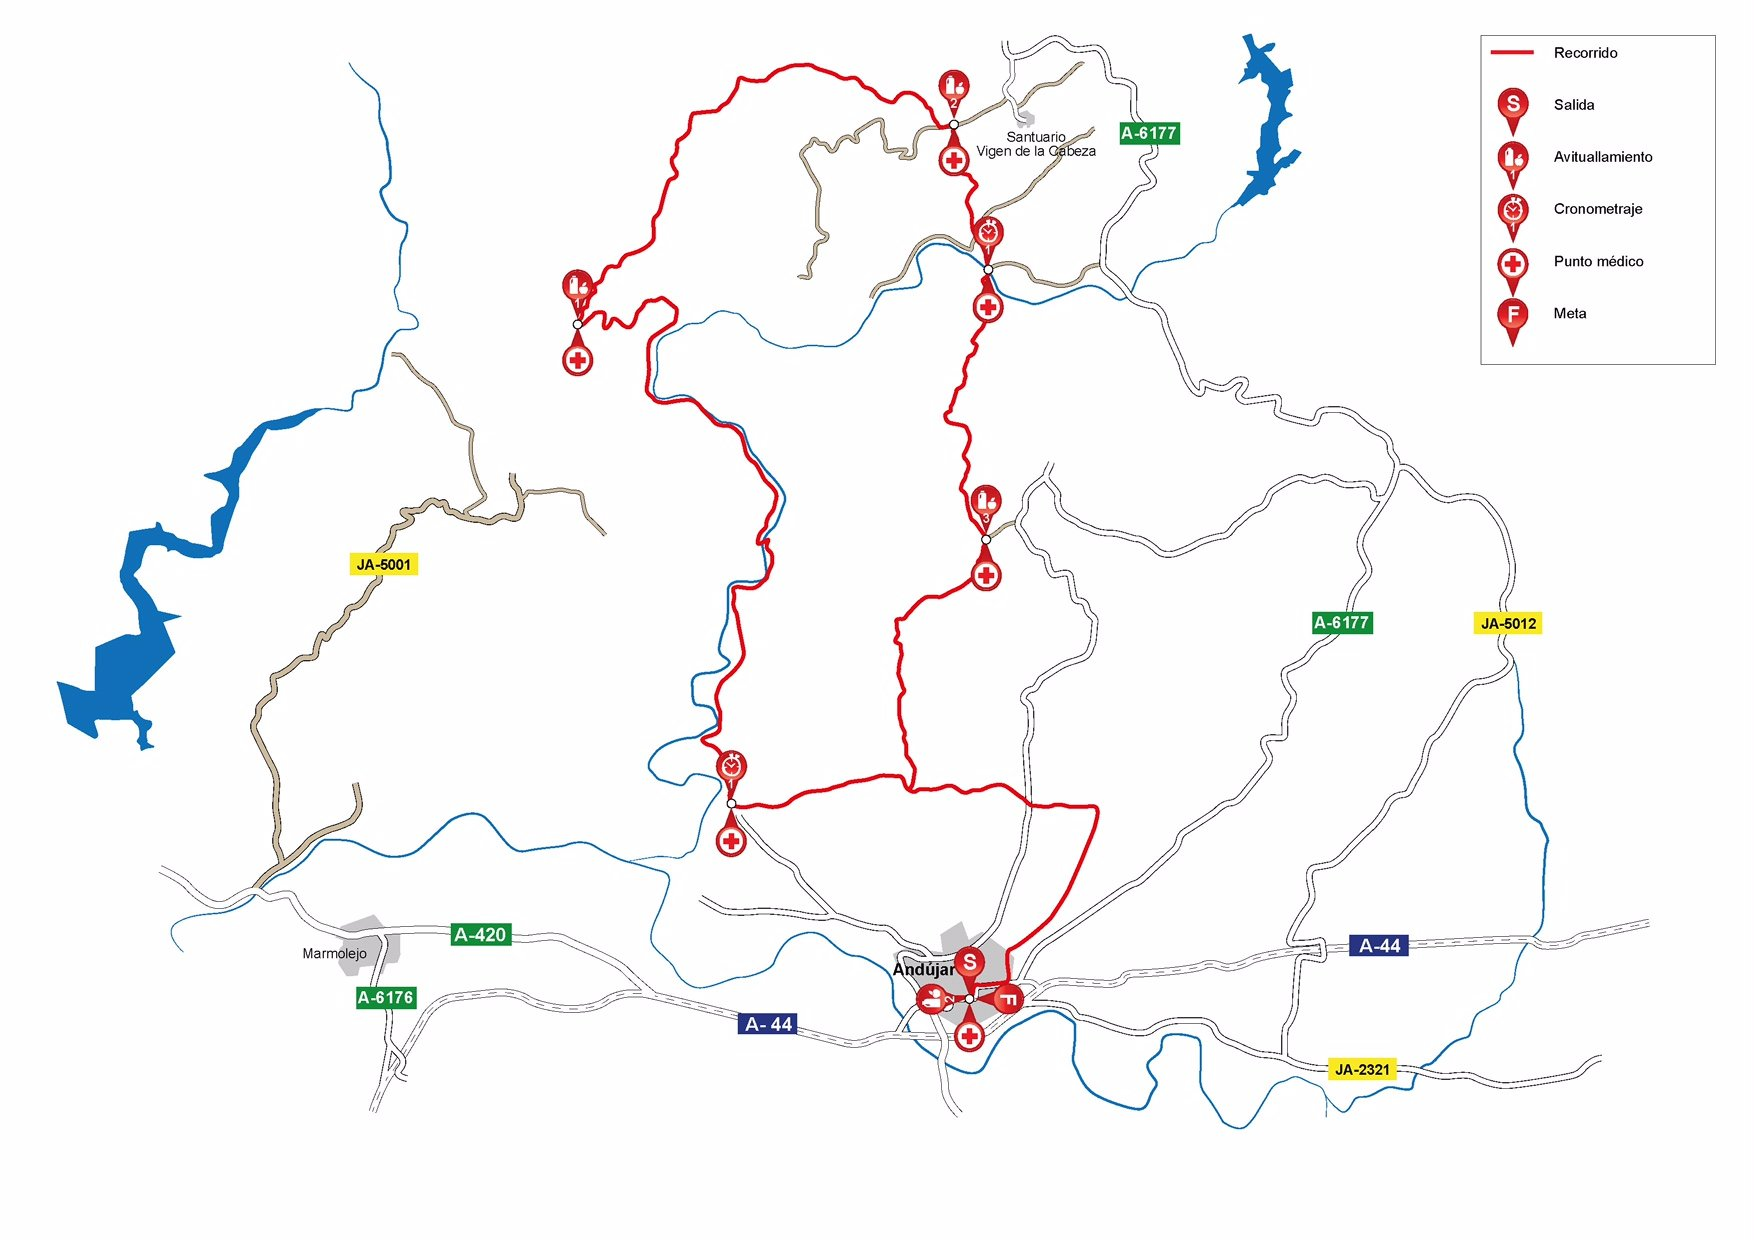 etapa 3 Andalucía bike race perfil